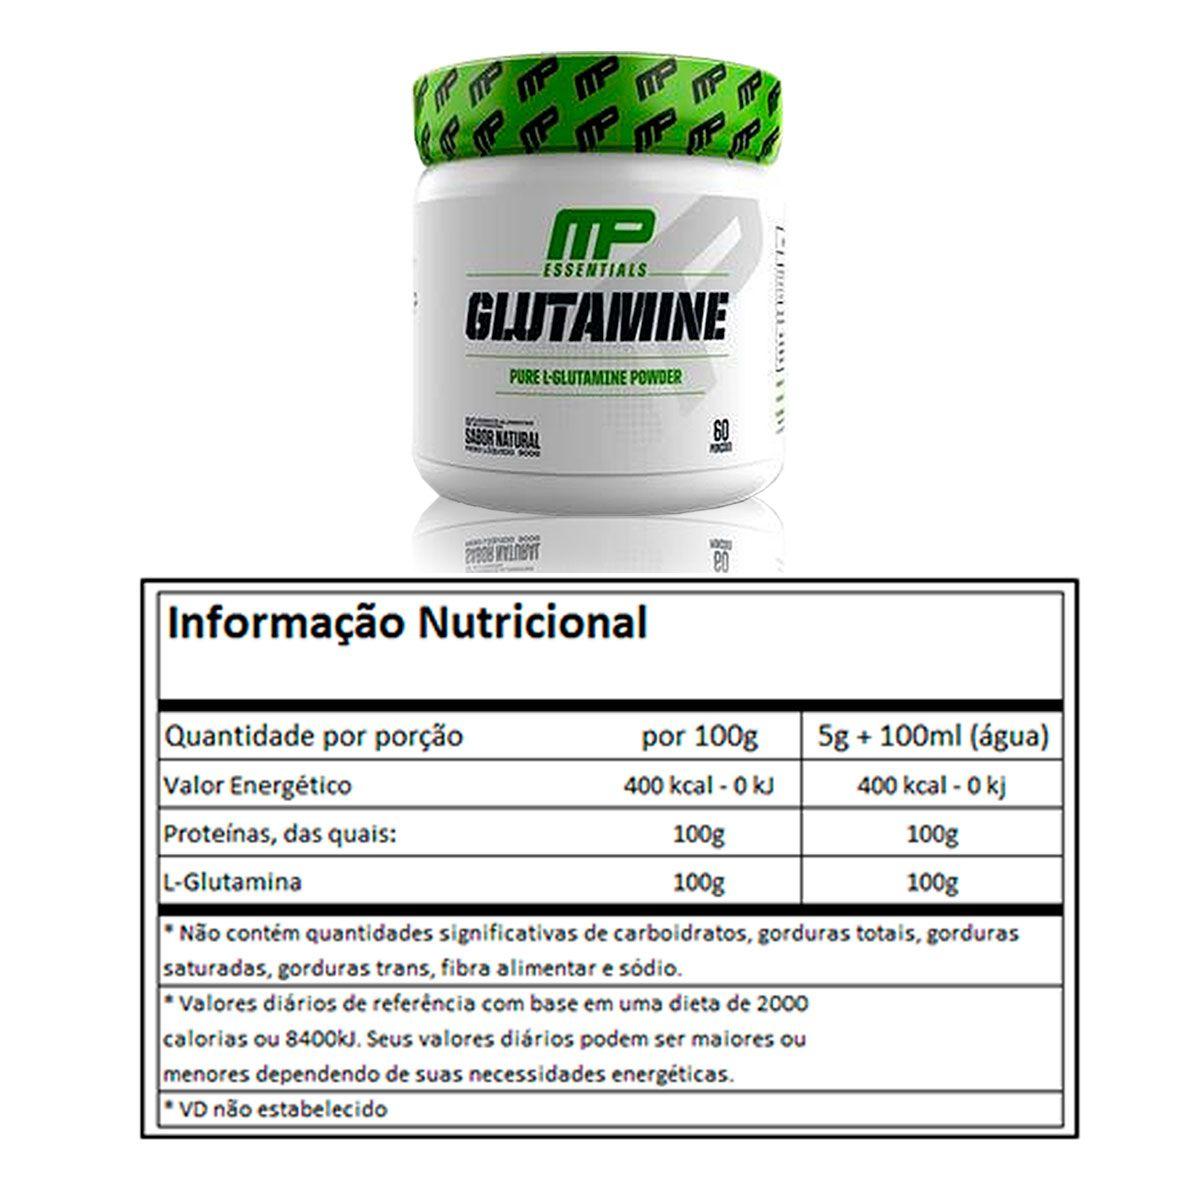 Kit Creatine 300g + Glutamine 300g + Coqueteleira - Muscle Pharm